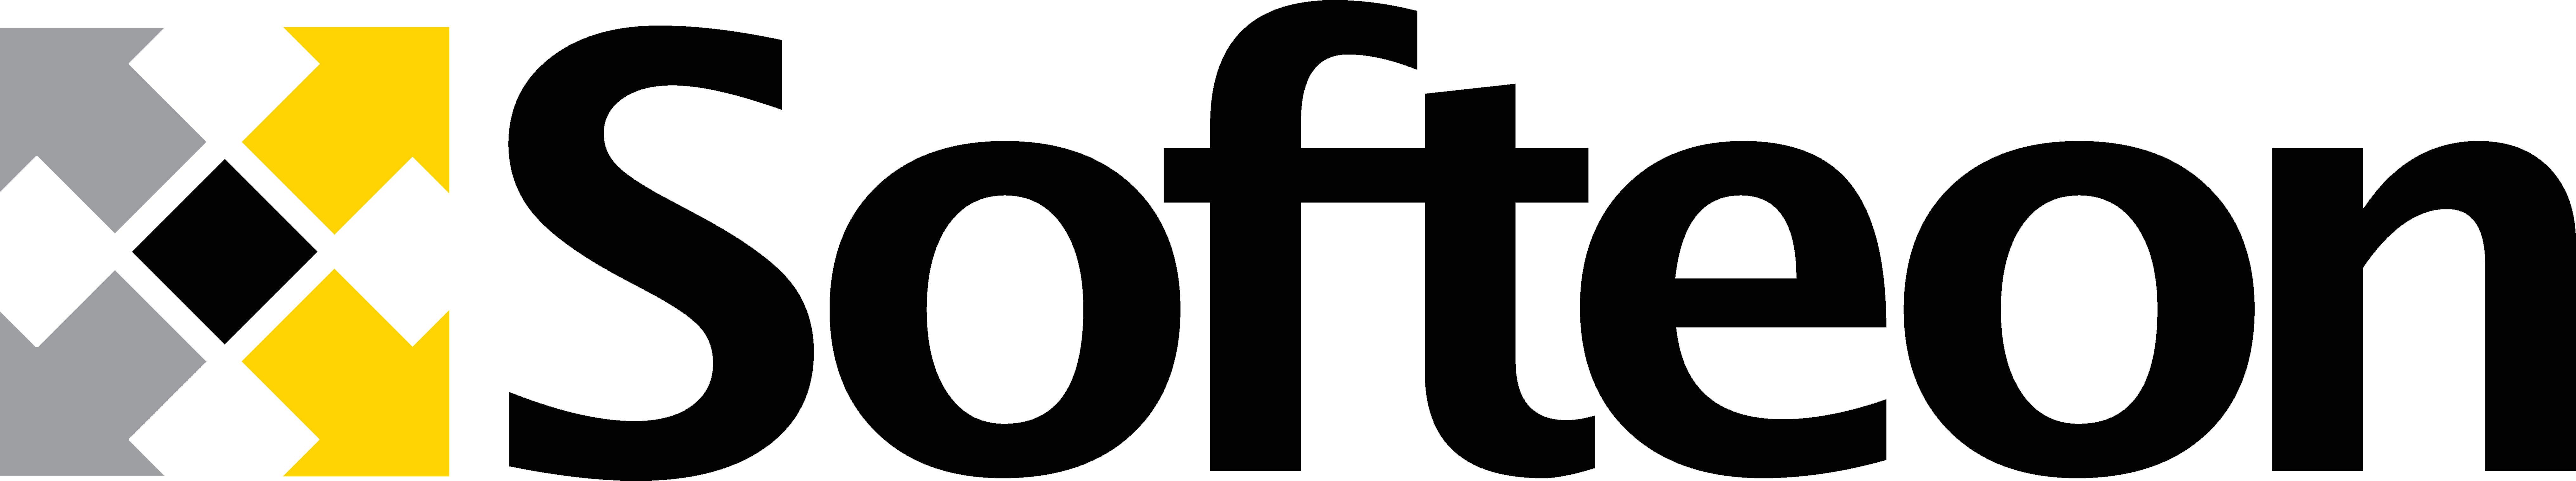 https://0201.nccdn.net/1_2/000/000/0ab/9e2/softeon_logo.jpg